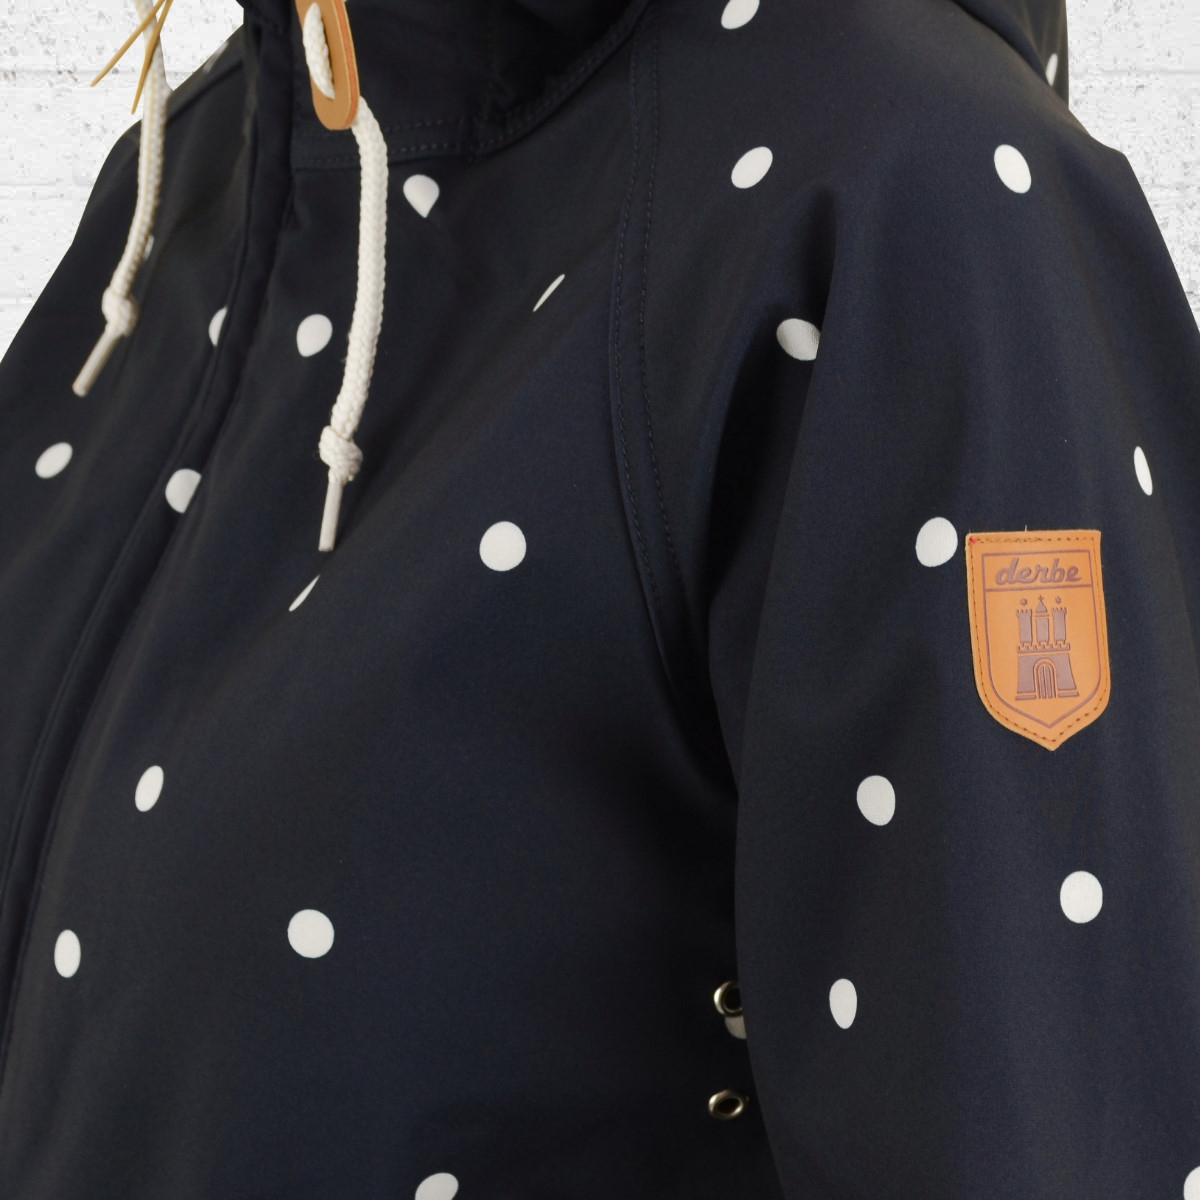 NowDerbe Coat Friese Ladies Jacket Order Island Navy Dots 0mOnwN8vy